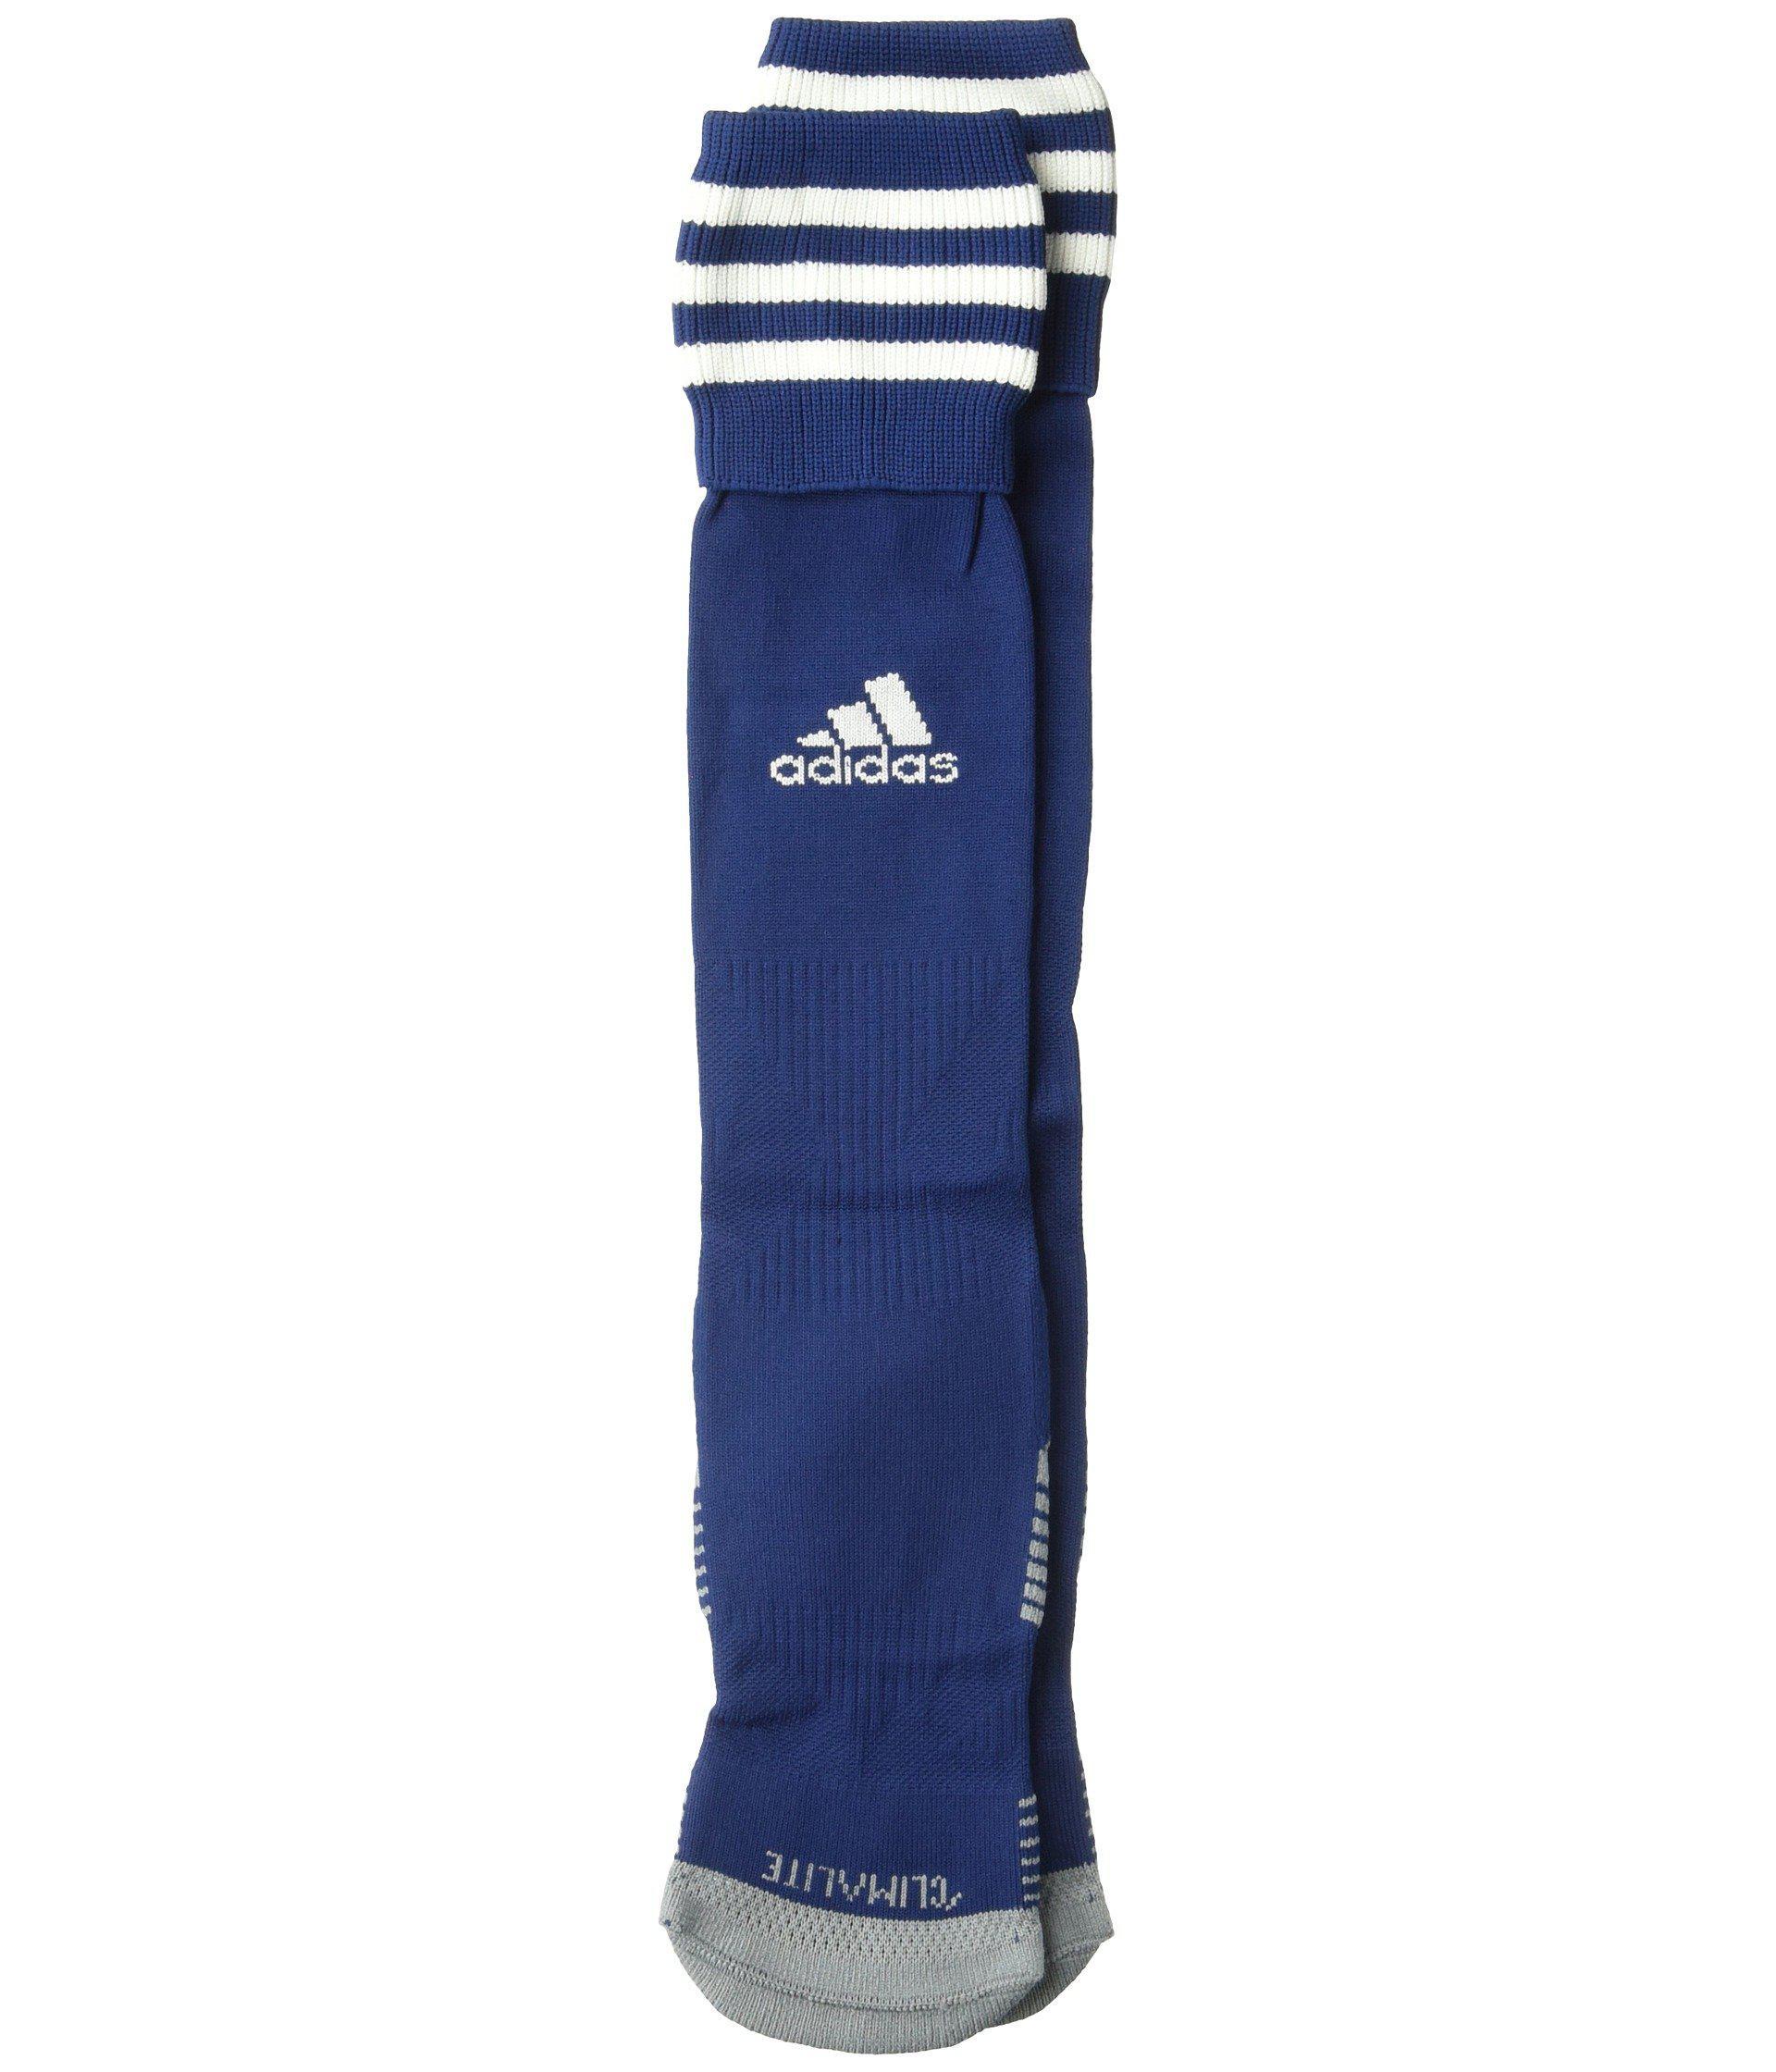 4366317a1 Lyst - adidas Copa Zone Cushion Iii Otc Sock (white/ Cobalt) Crew ...